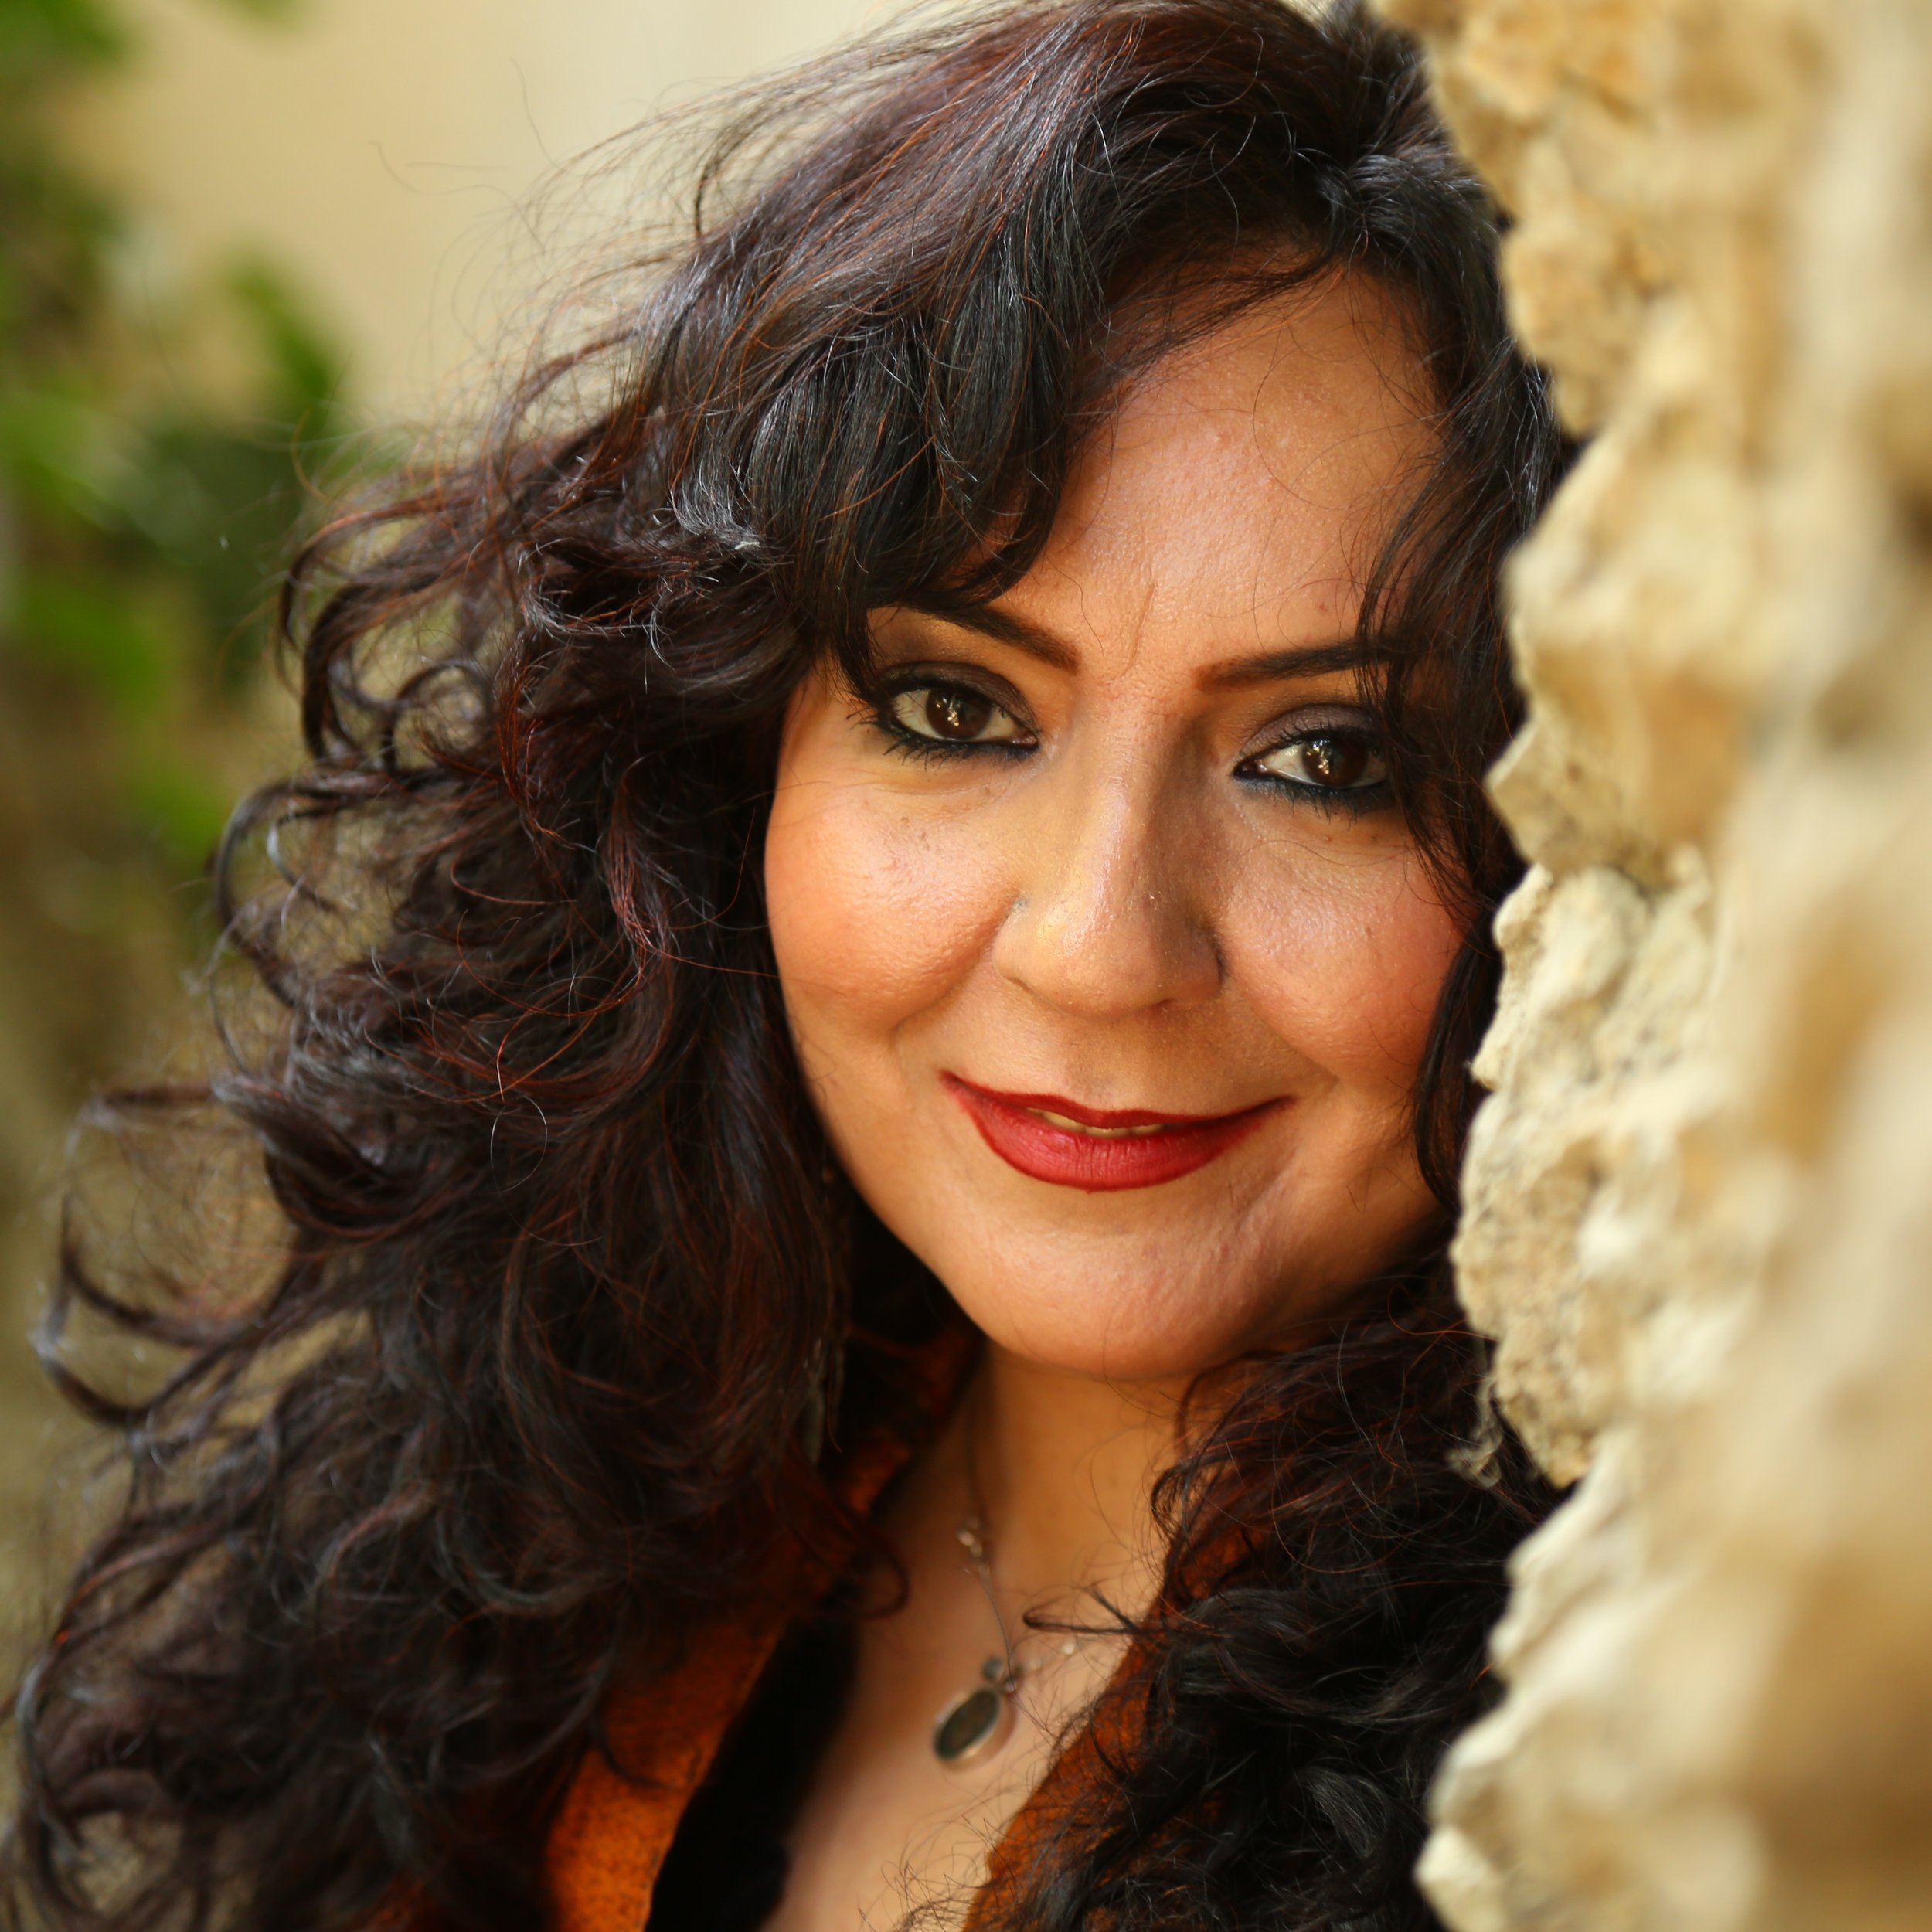 Mahsa Vahdat Photo by Tahmineh Monzavi  .JPG